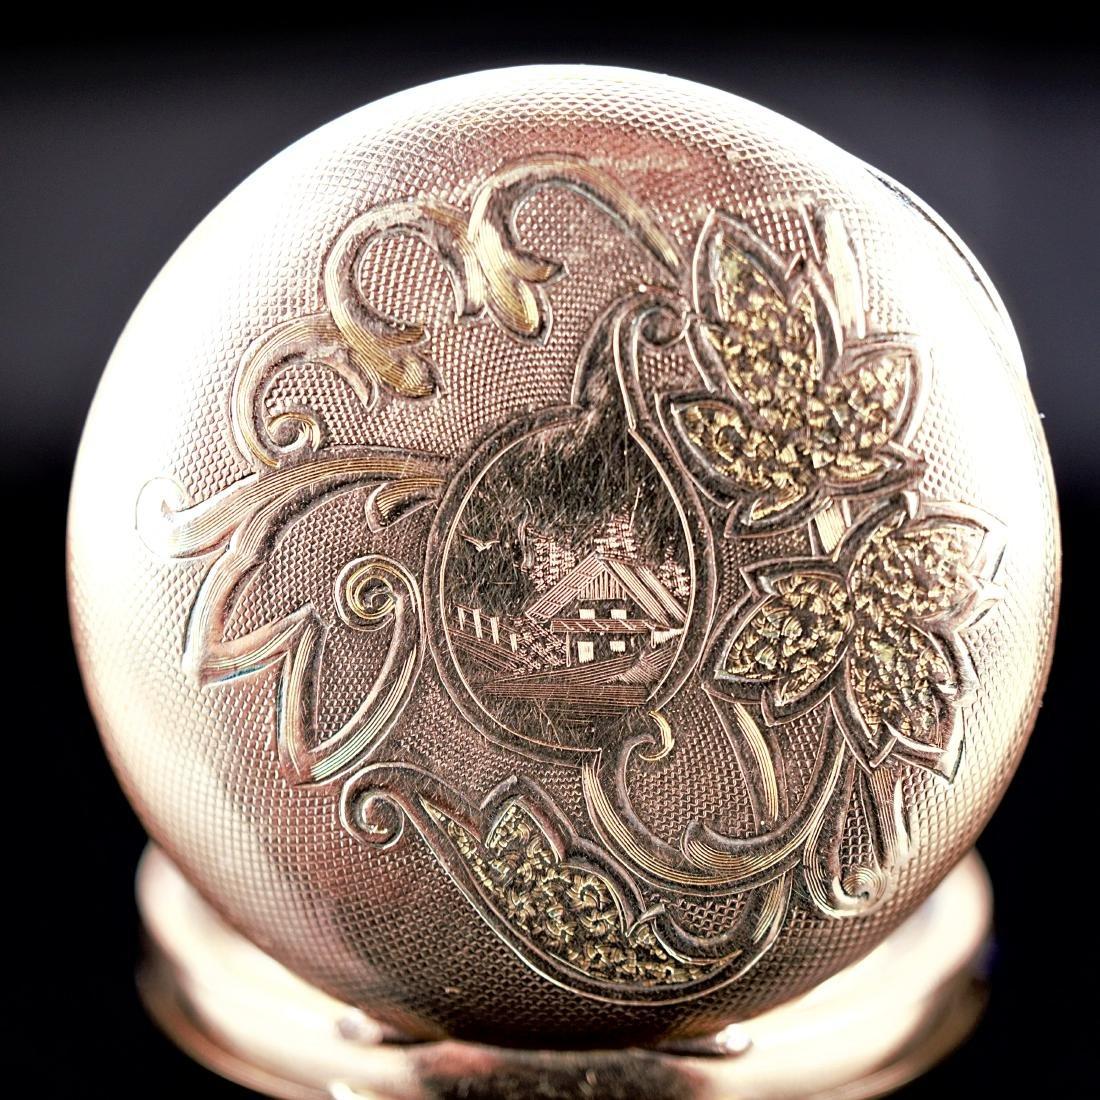 Hampden Dueber Special Gold Filled Pocket Watch 16S